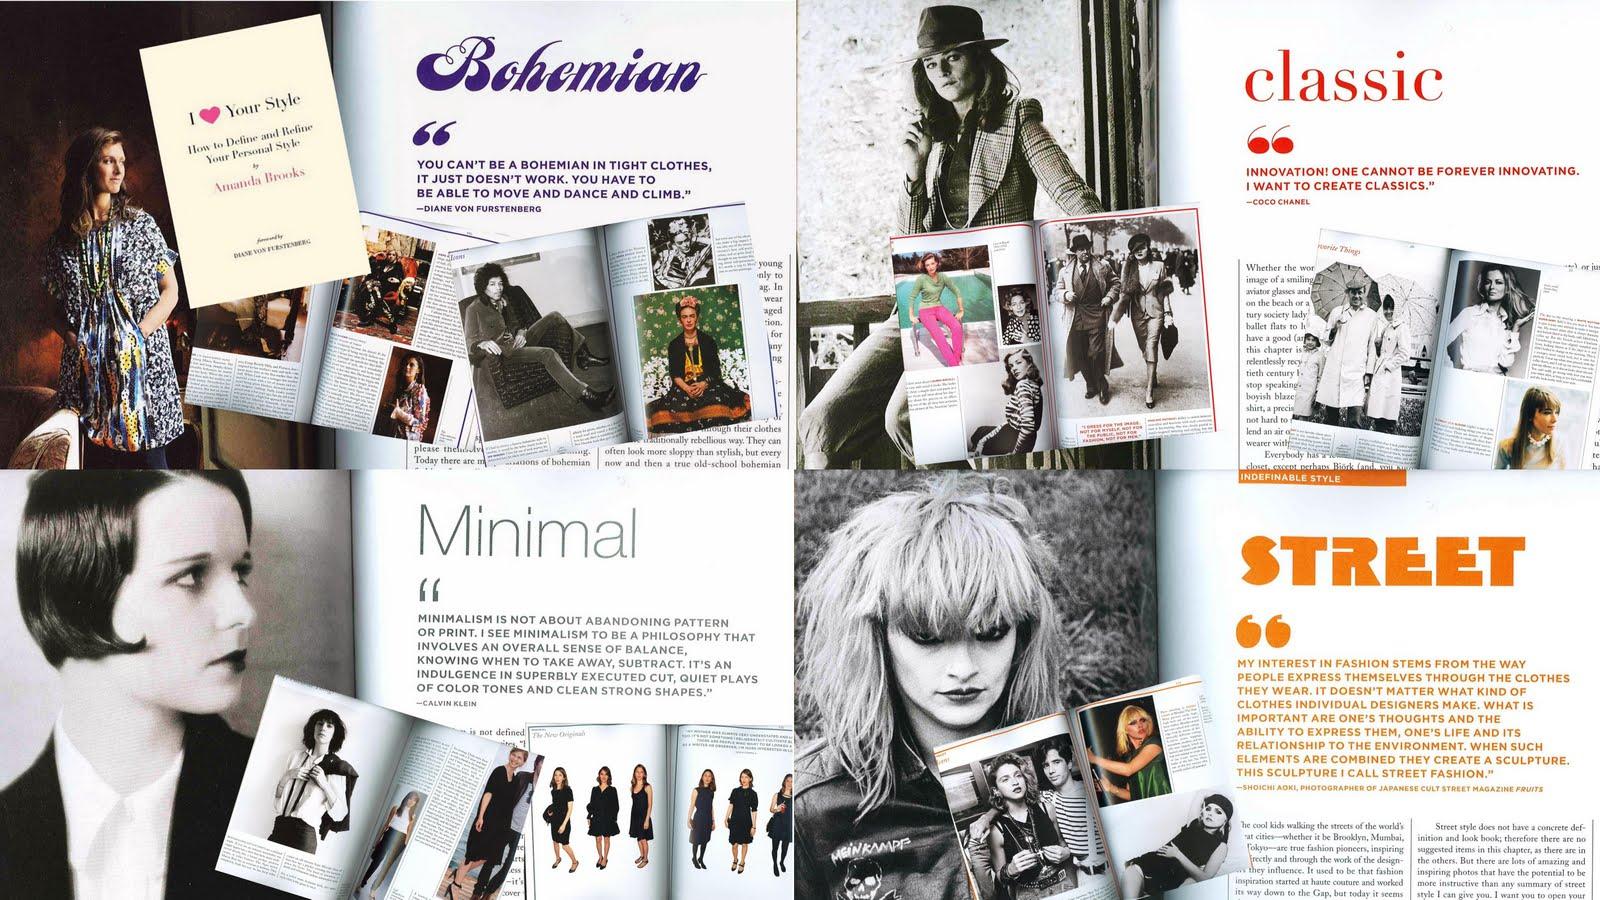 Http Www Fashionwindows Com Fashion Designers Showall Fashion Designers Asp